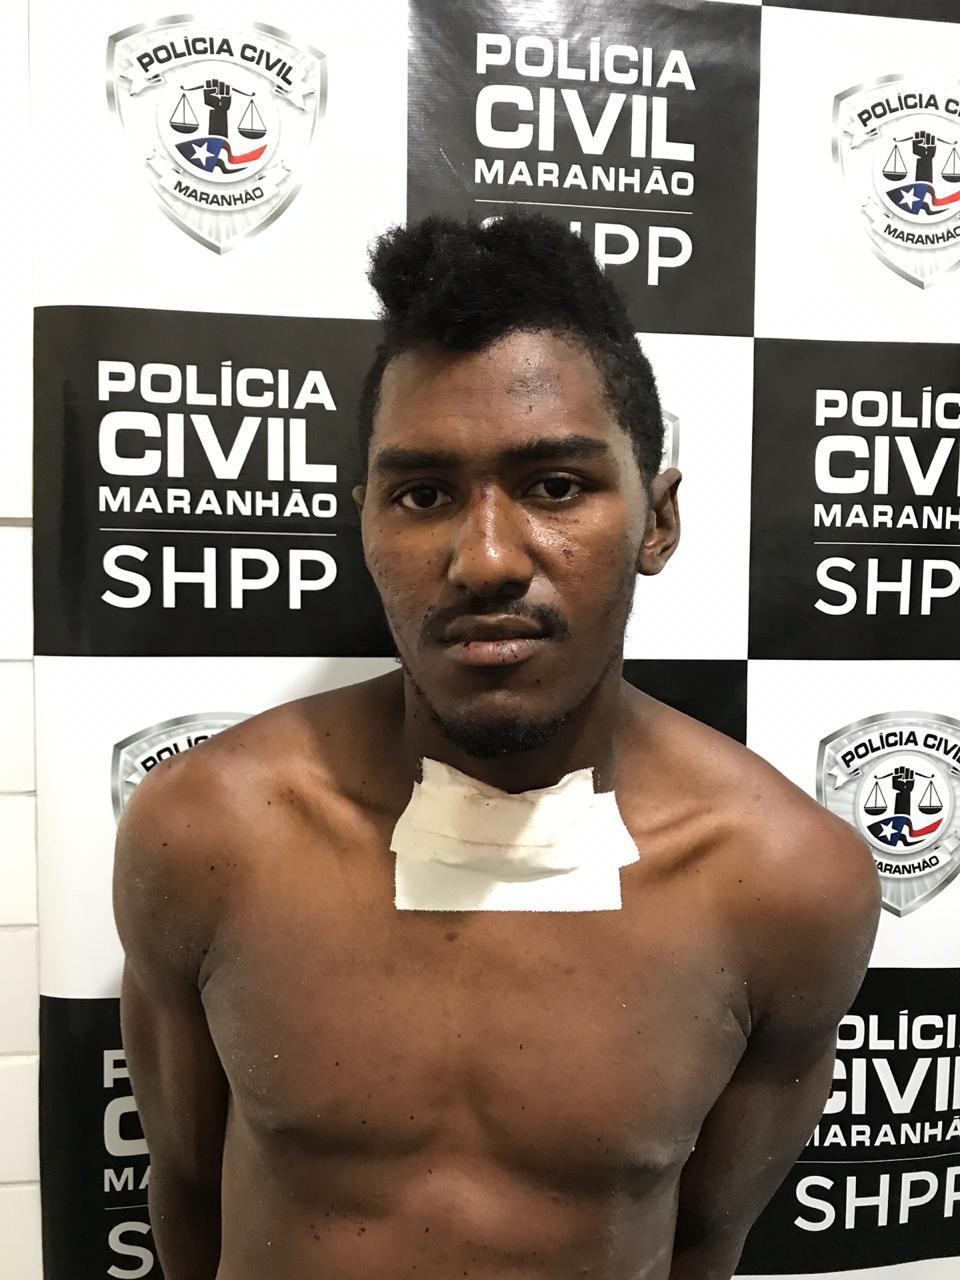 Suspeito foi preso em flagrante